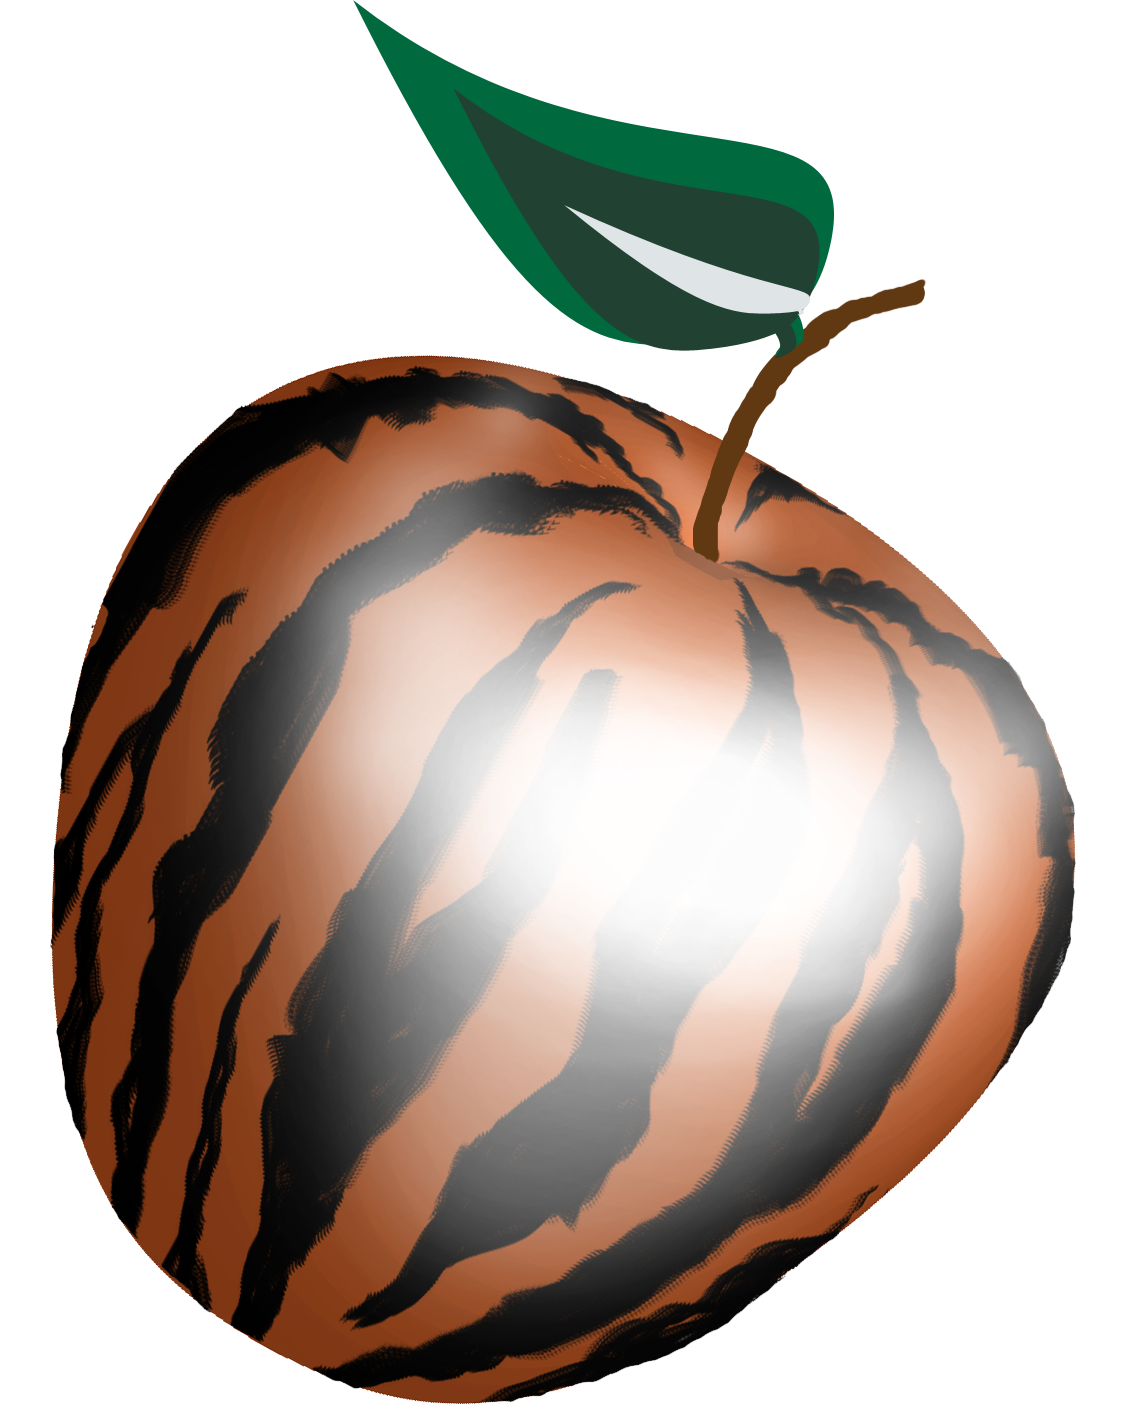 Tiger-Fruit